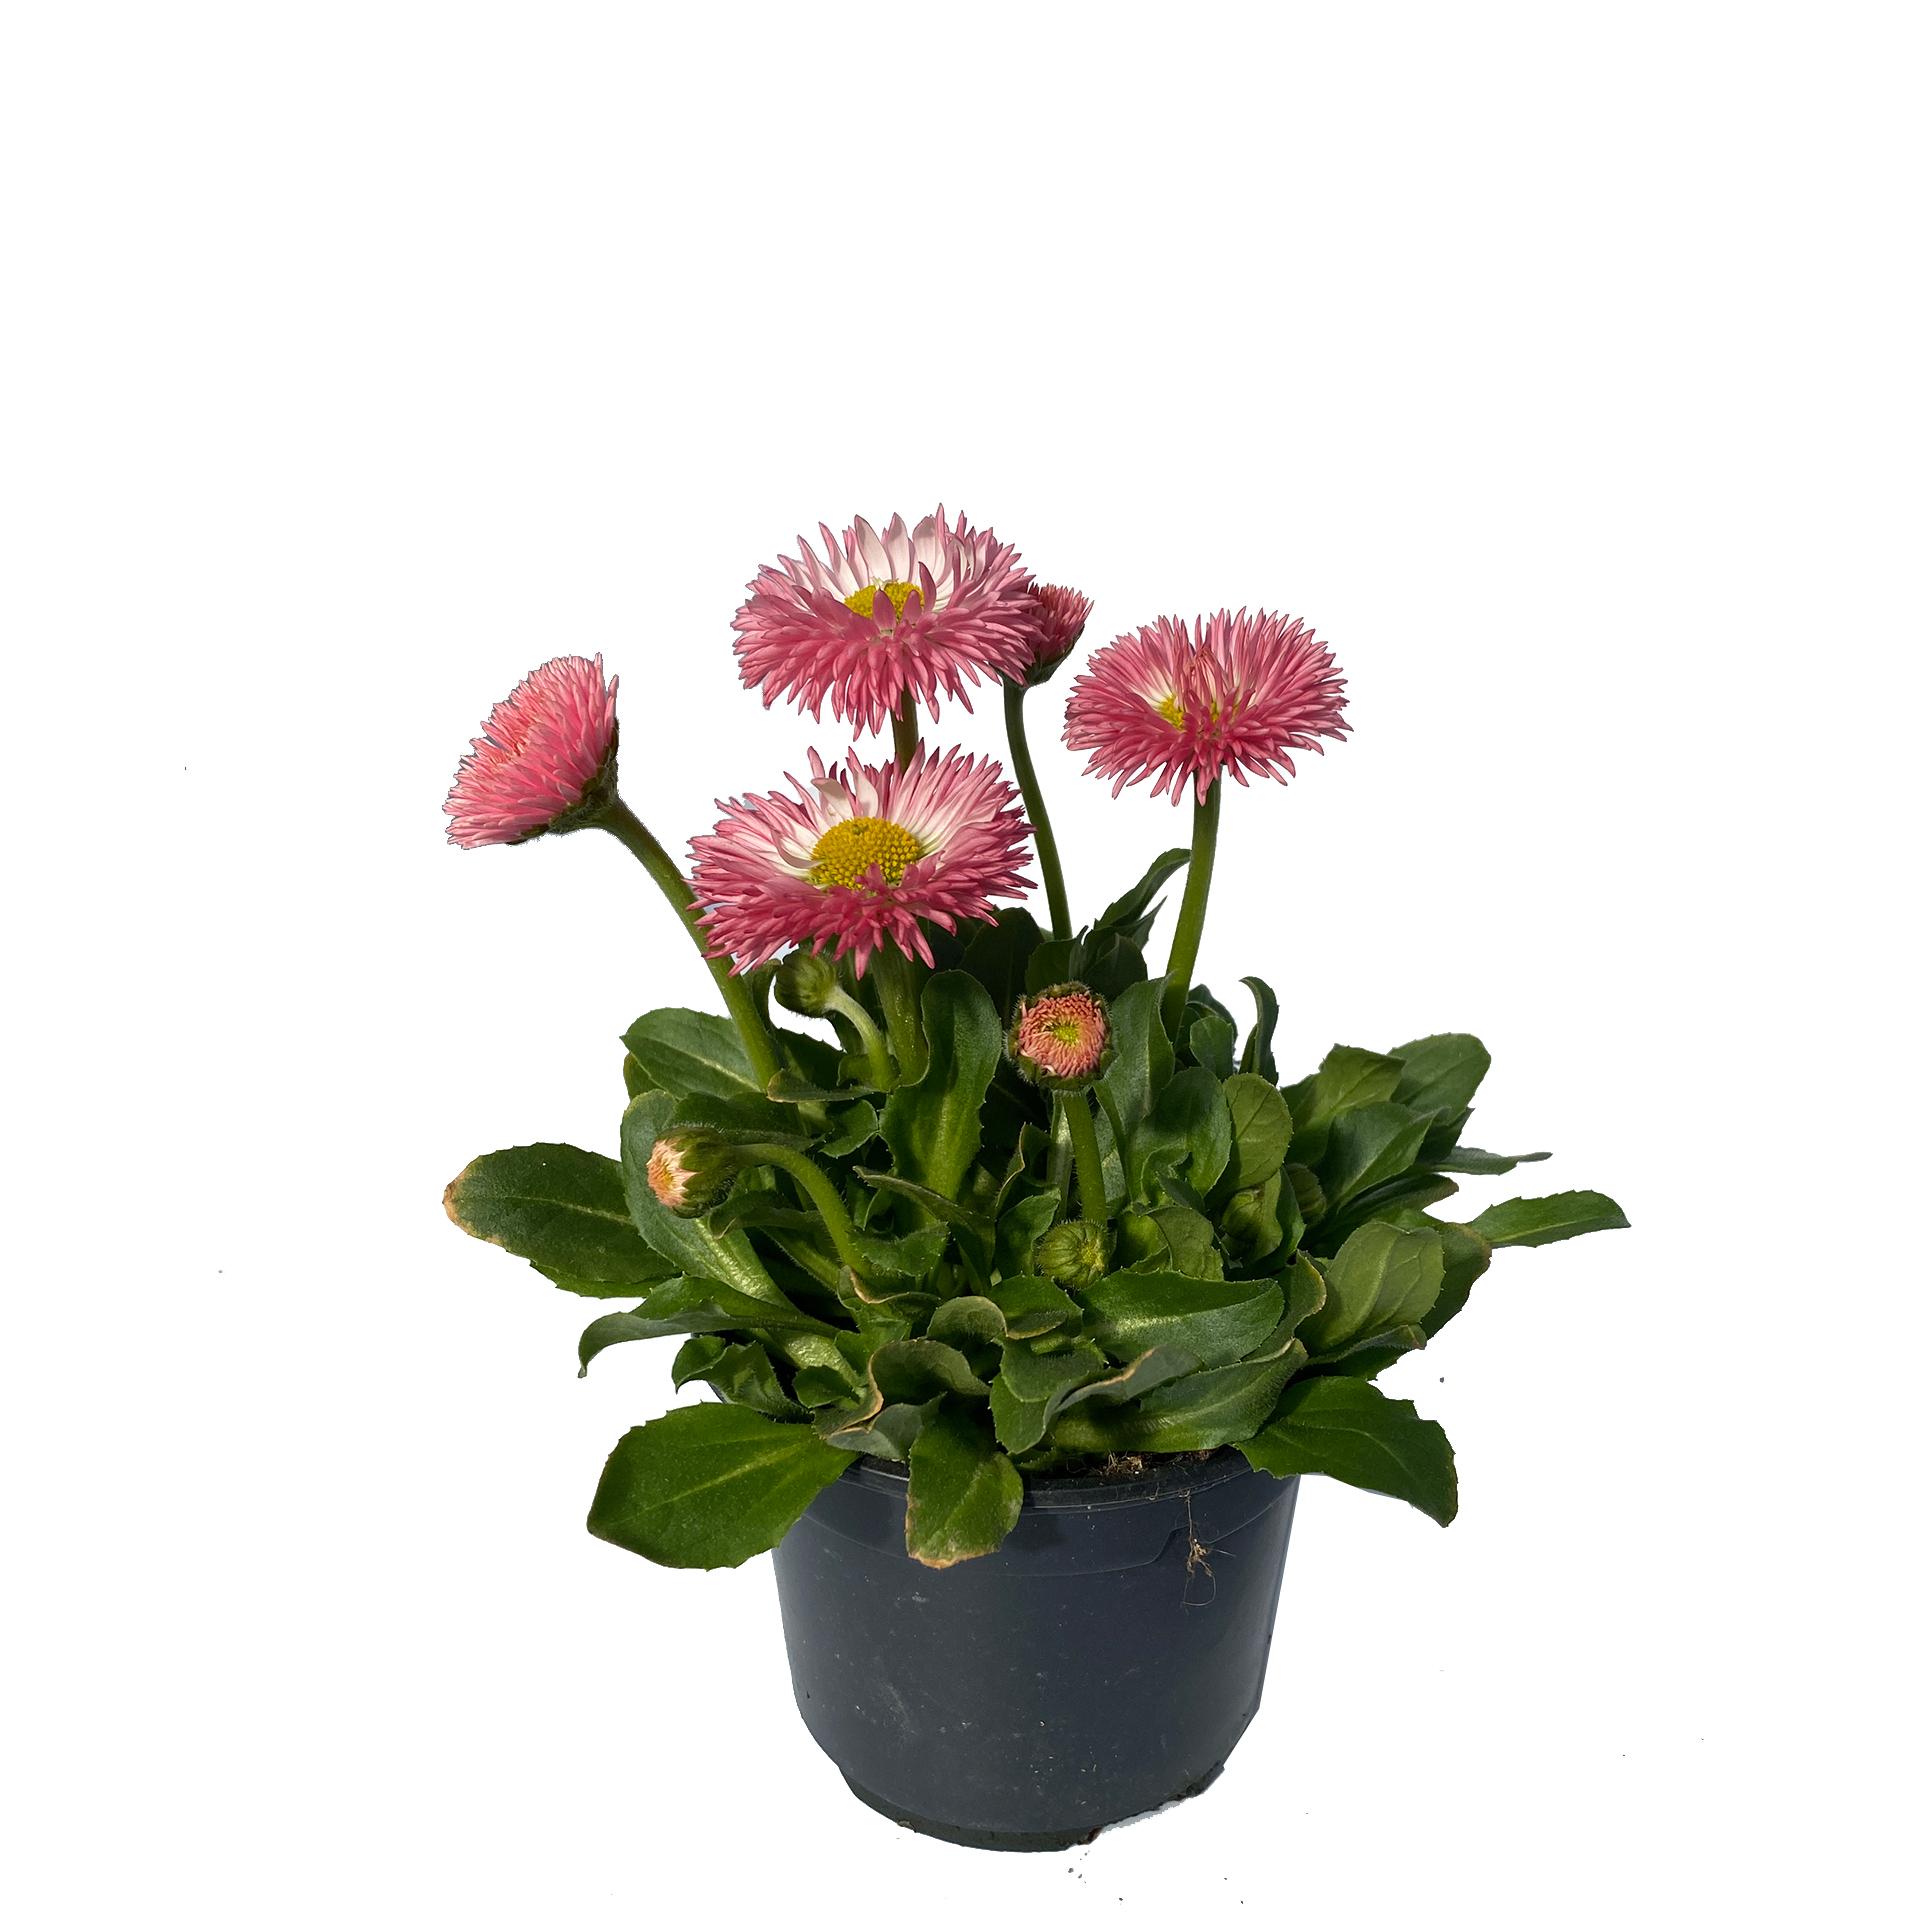 Gänseblümchen Bellis - Bellis perennis, rosa, 11cm Topf